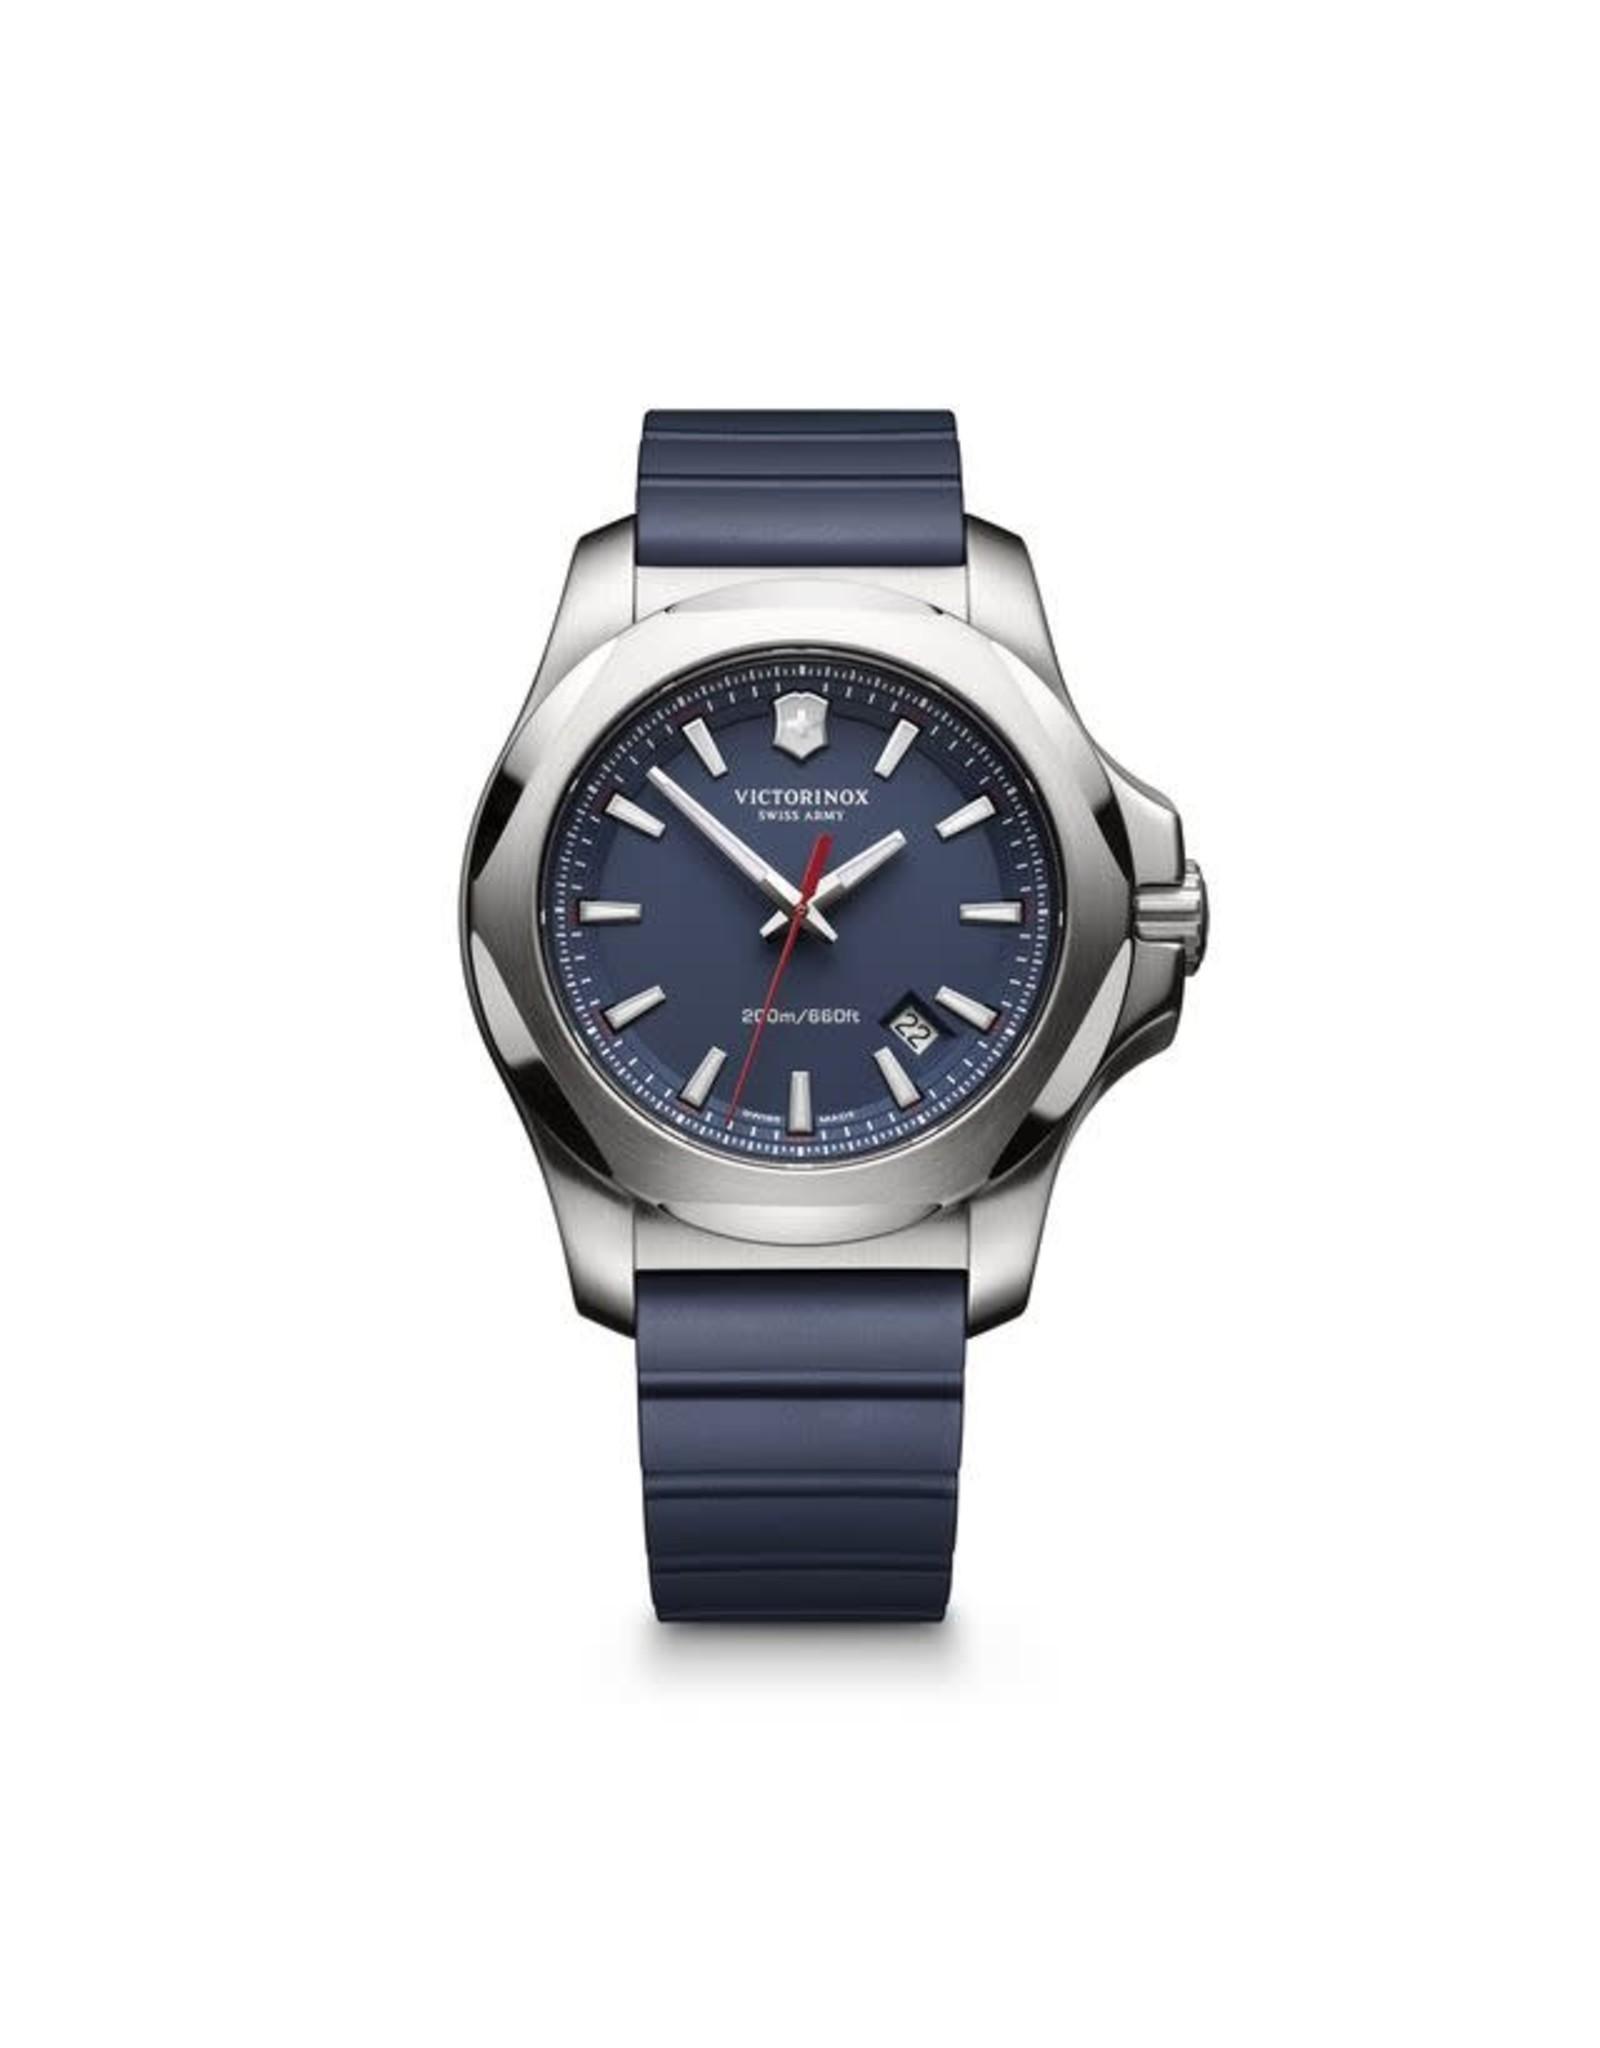 Victorinox Victorinox 241688.1 I.N.O.X blue 43mm